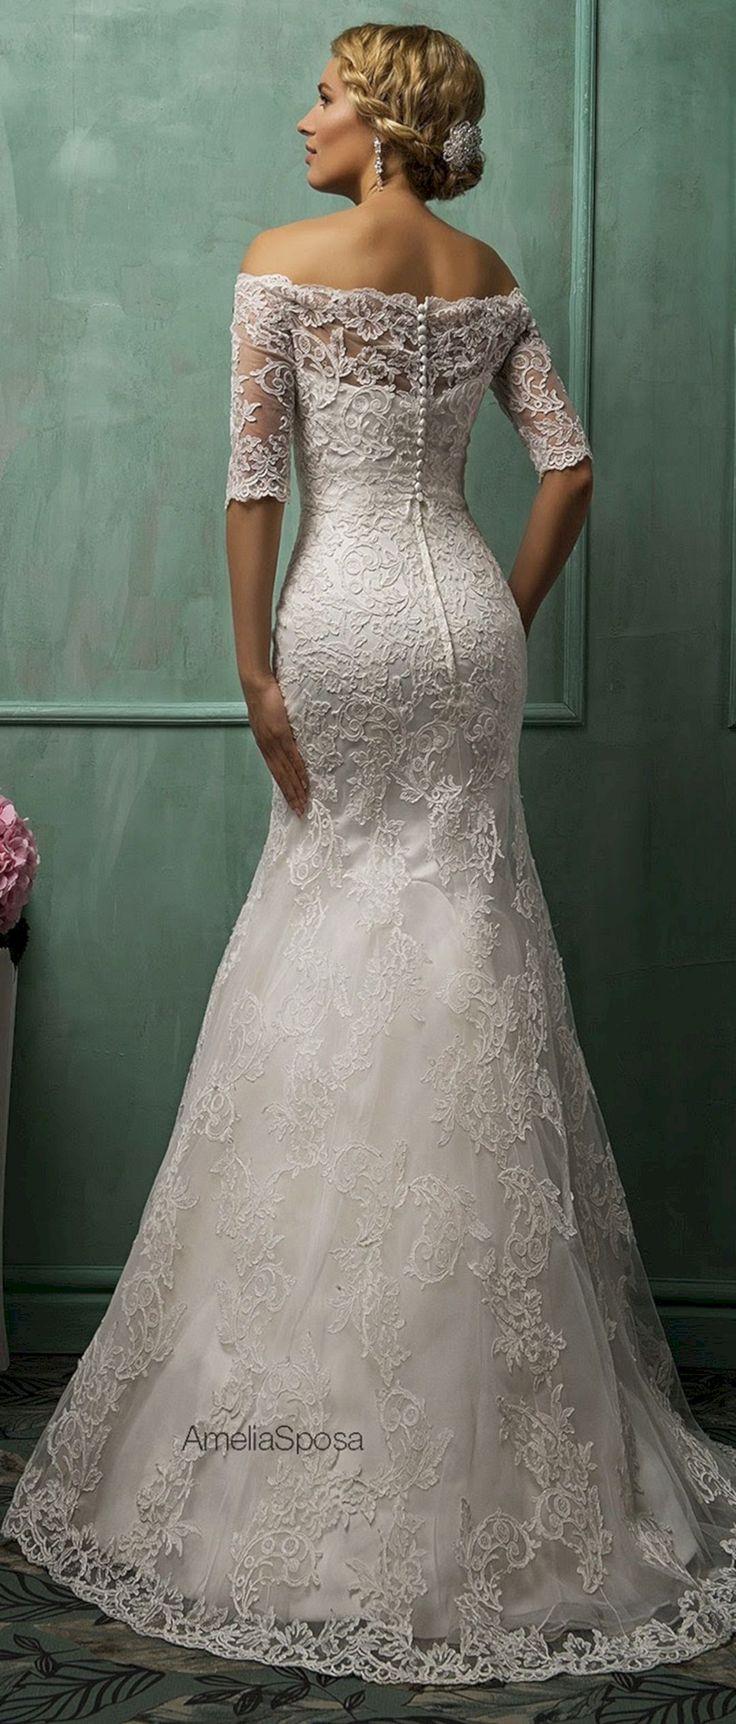 Cool 20+ Exclusive Amelia Sposa Wedding Dress Collections  https://oosile.com/20-exclusive-amelia-sposa-wedding-dress-collections-16204